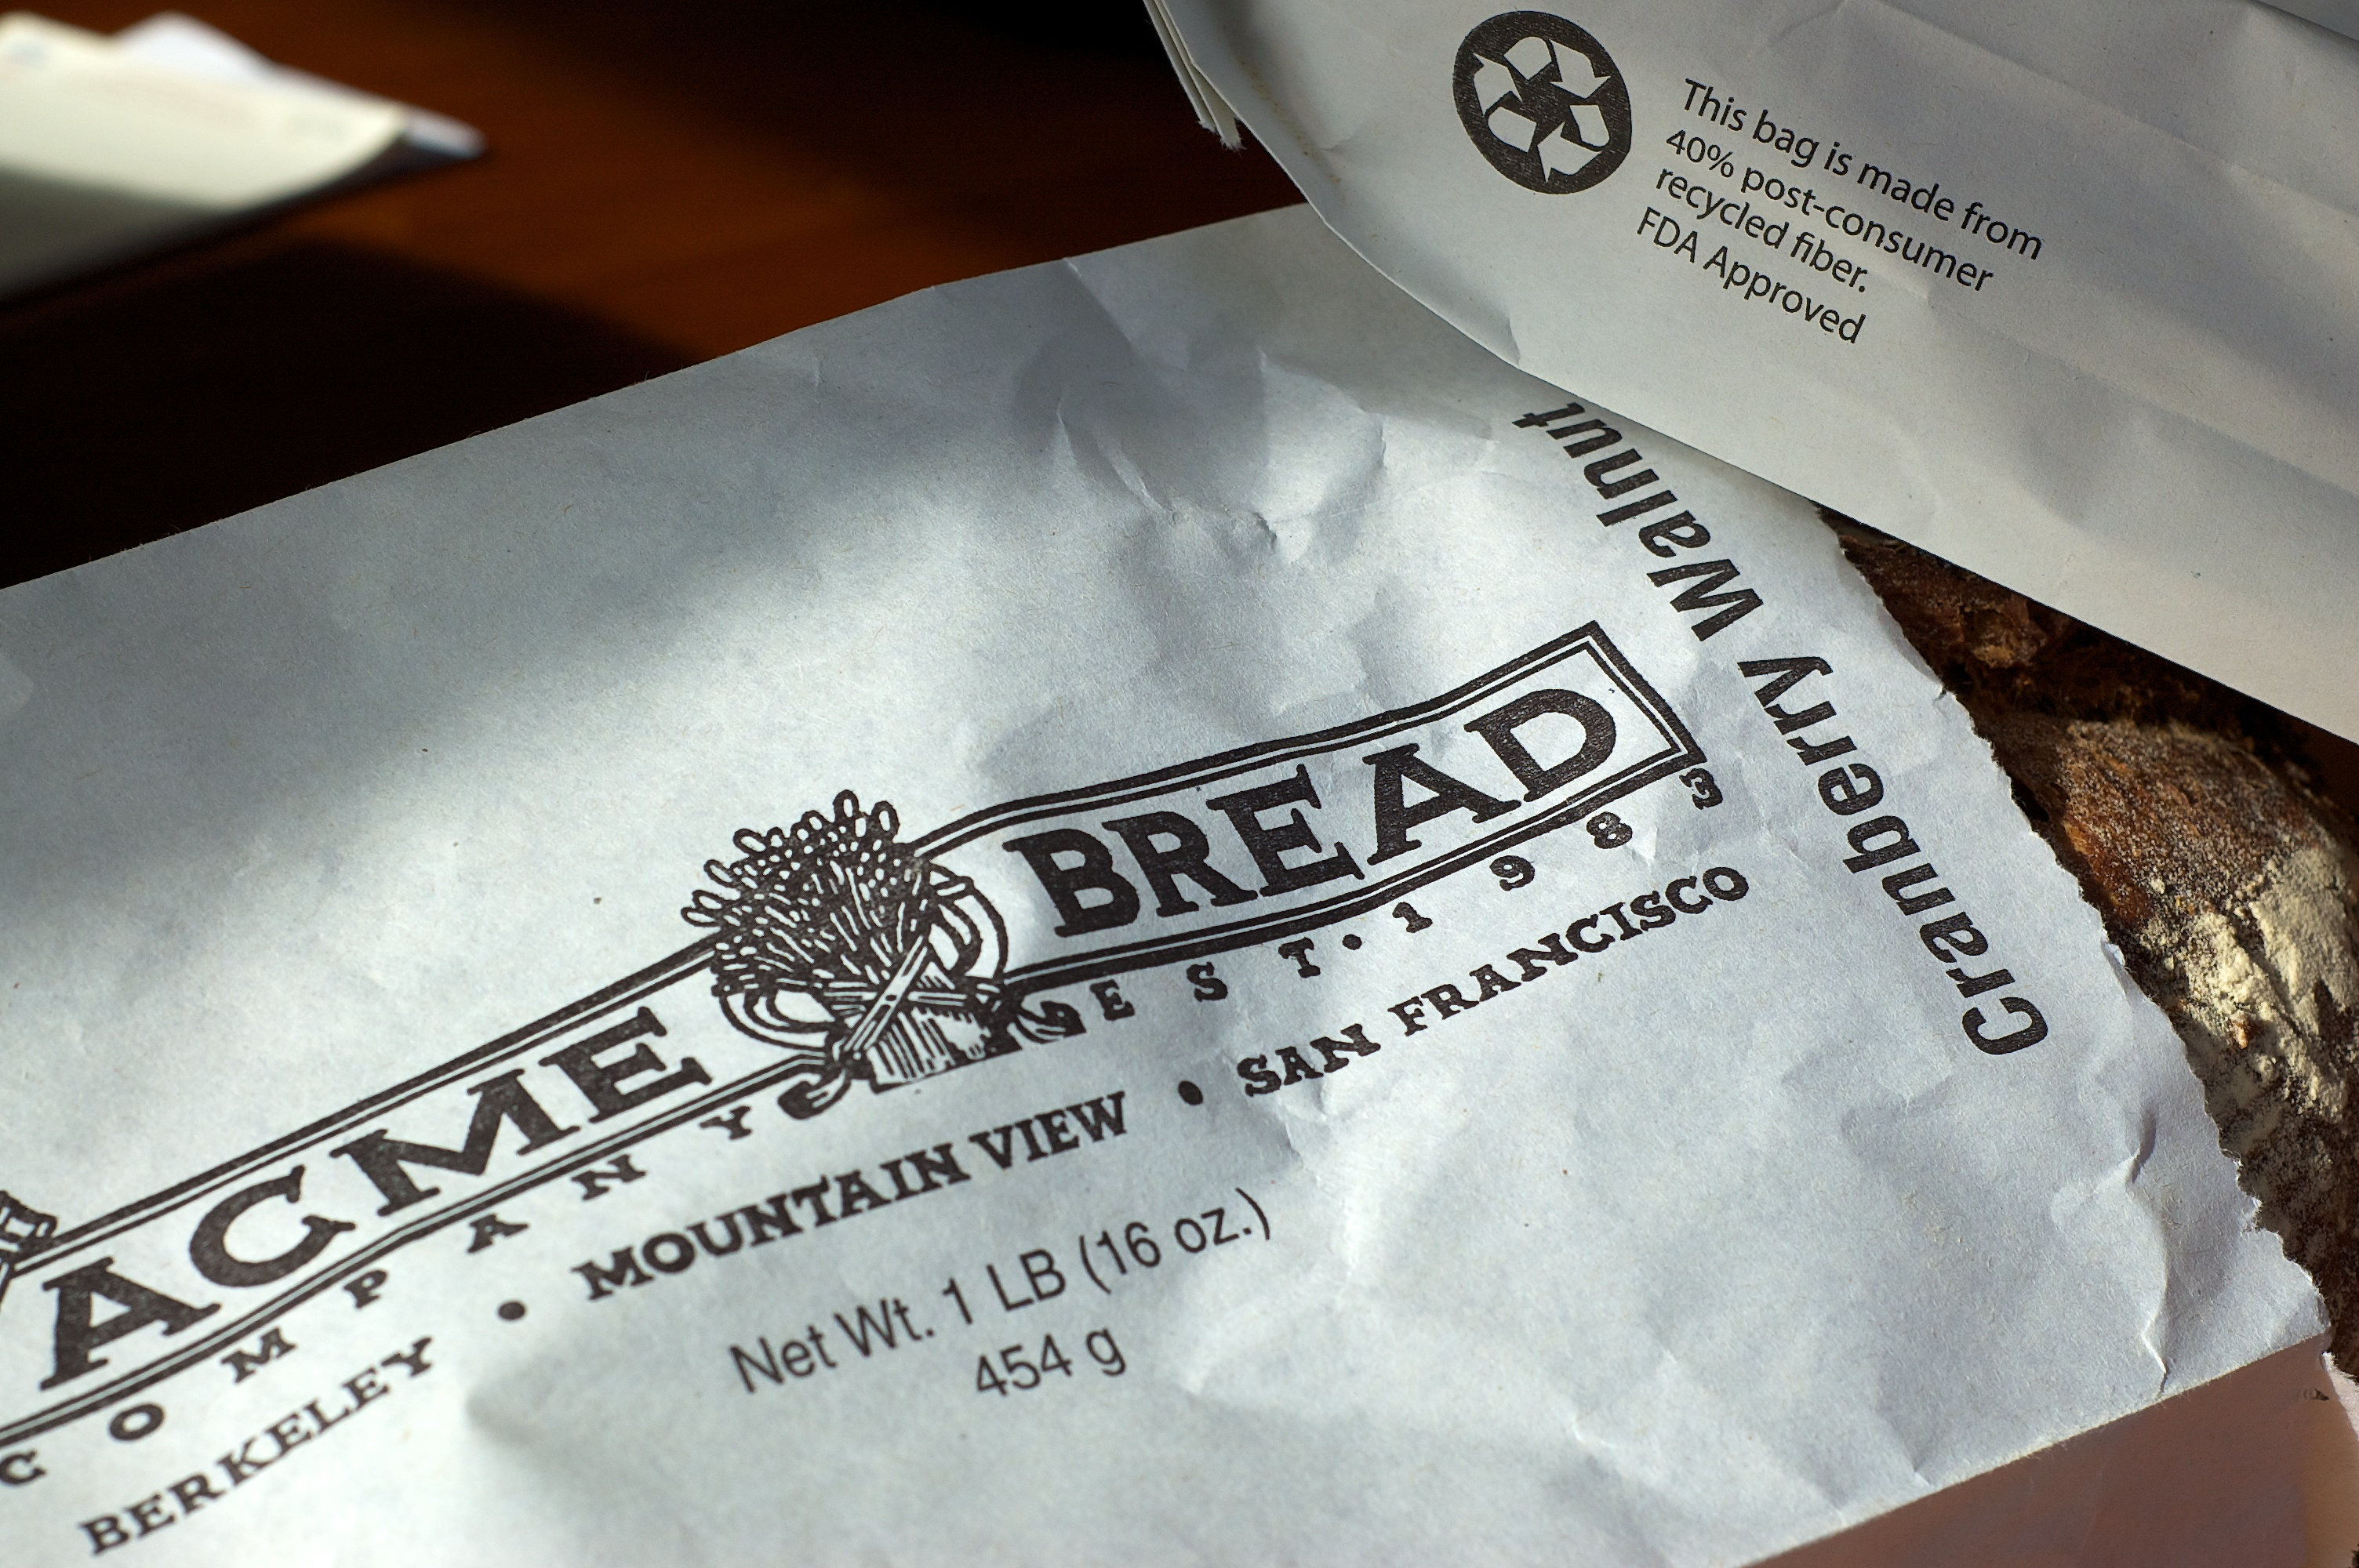 Acme Bread Custom Print Bags